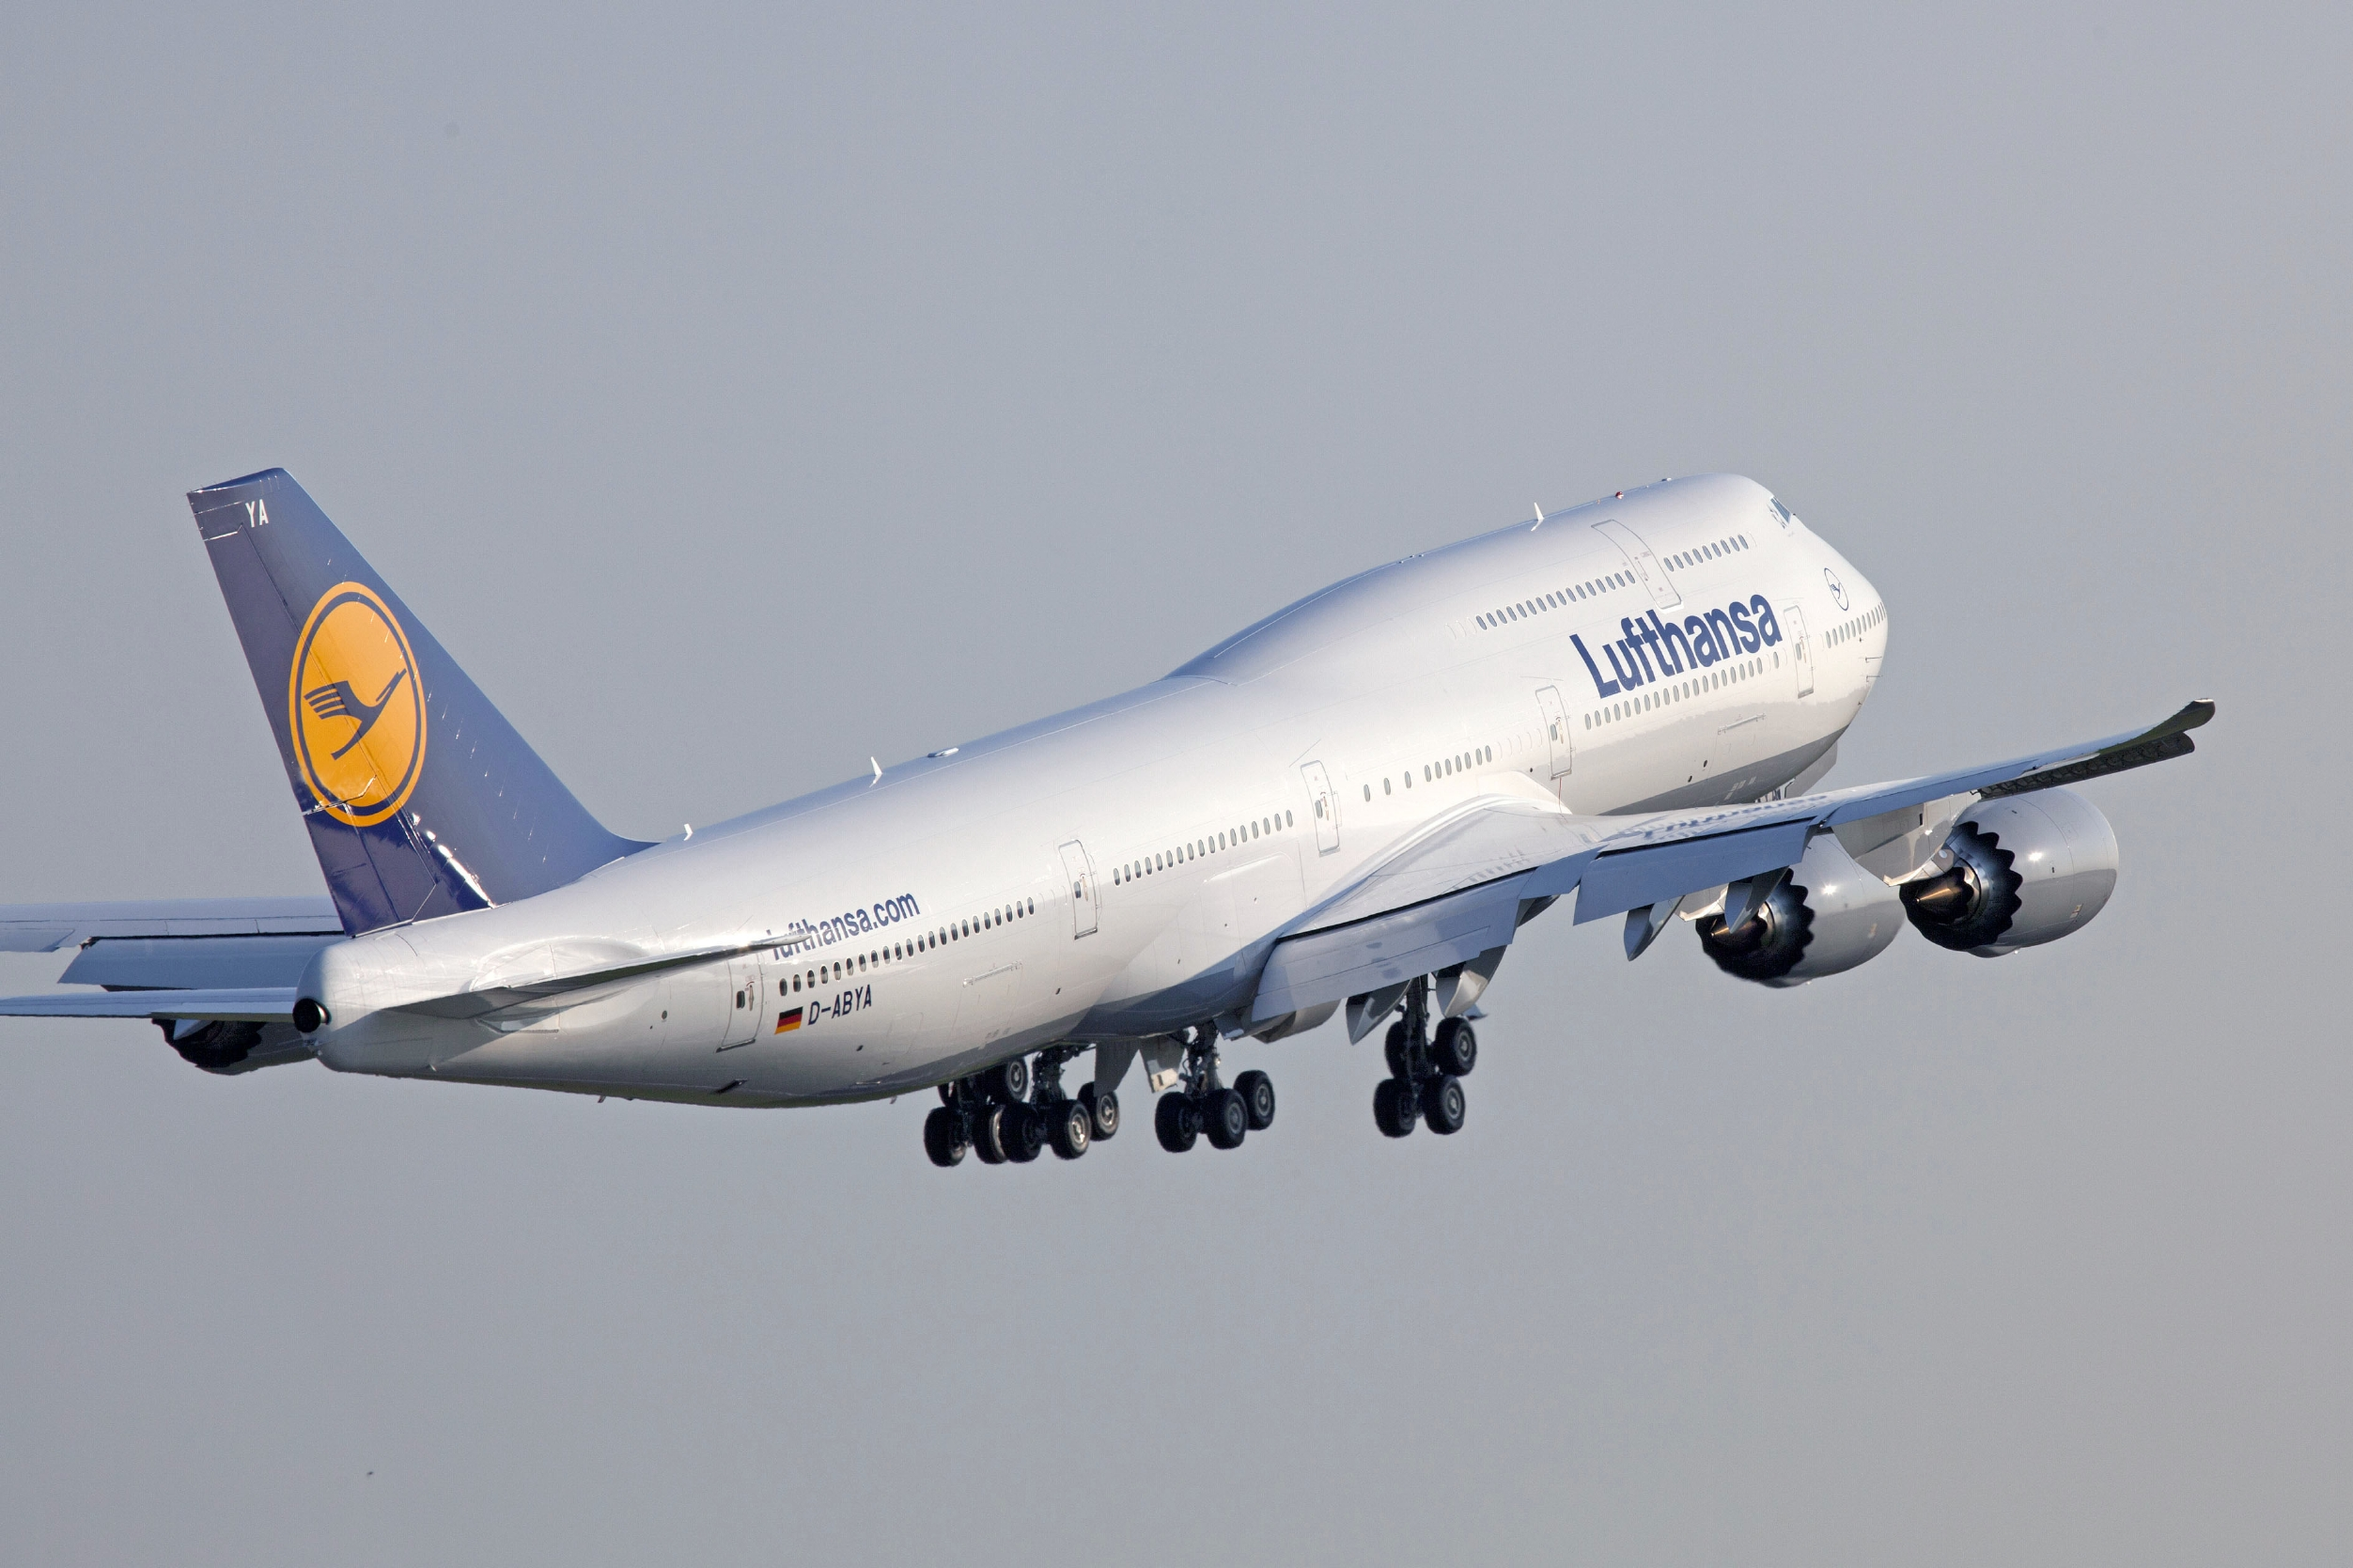 Boeing's new 747-8 Intercontinental: Same same, but different | CNN Travel